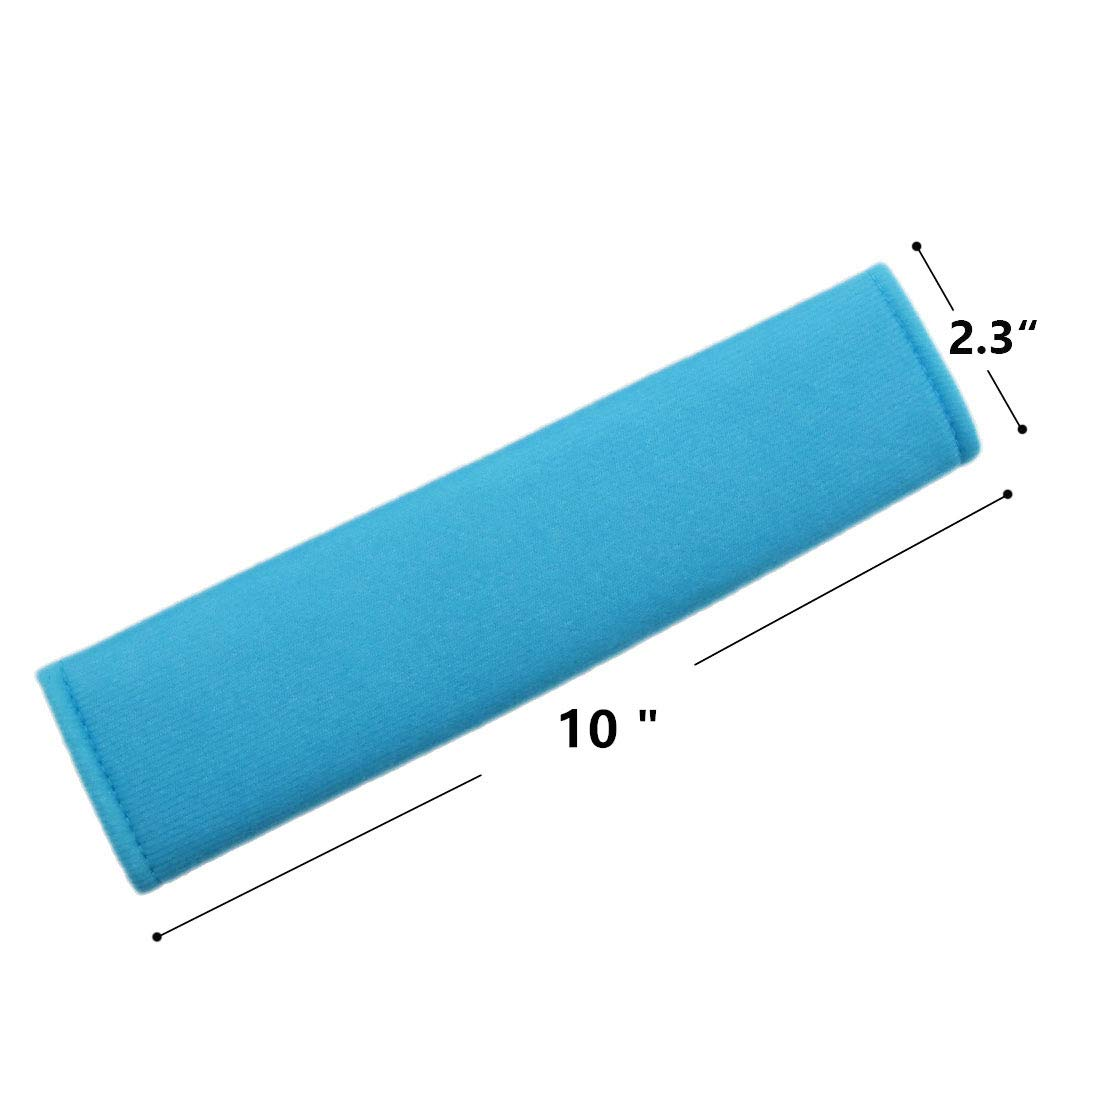 MIRKOO Car Seat Belt Cover Pad Laptop Computer Bag Backpack 4-Pack Soft Car Safety Seat Belt Strap Shoulder Pad for Adults and Children Blue-4P Shoulder Bag Suitable for Car Seat Belt